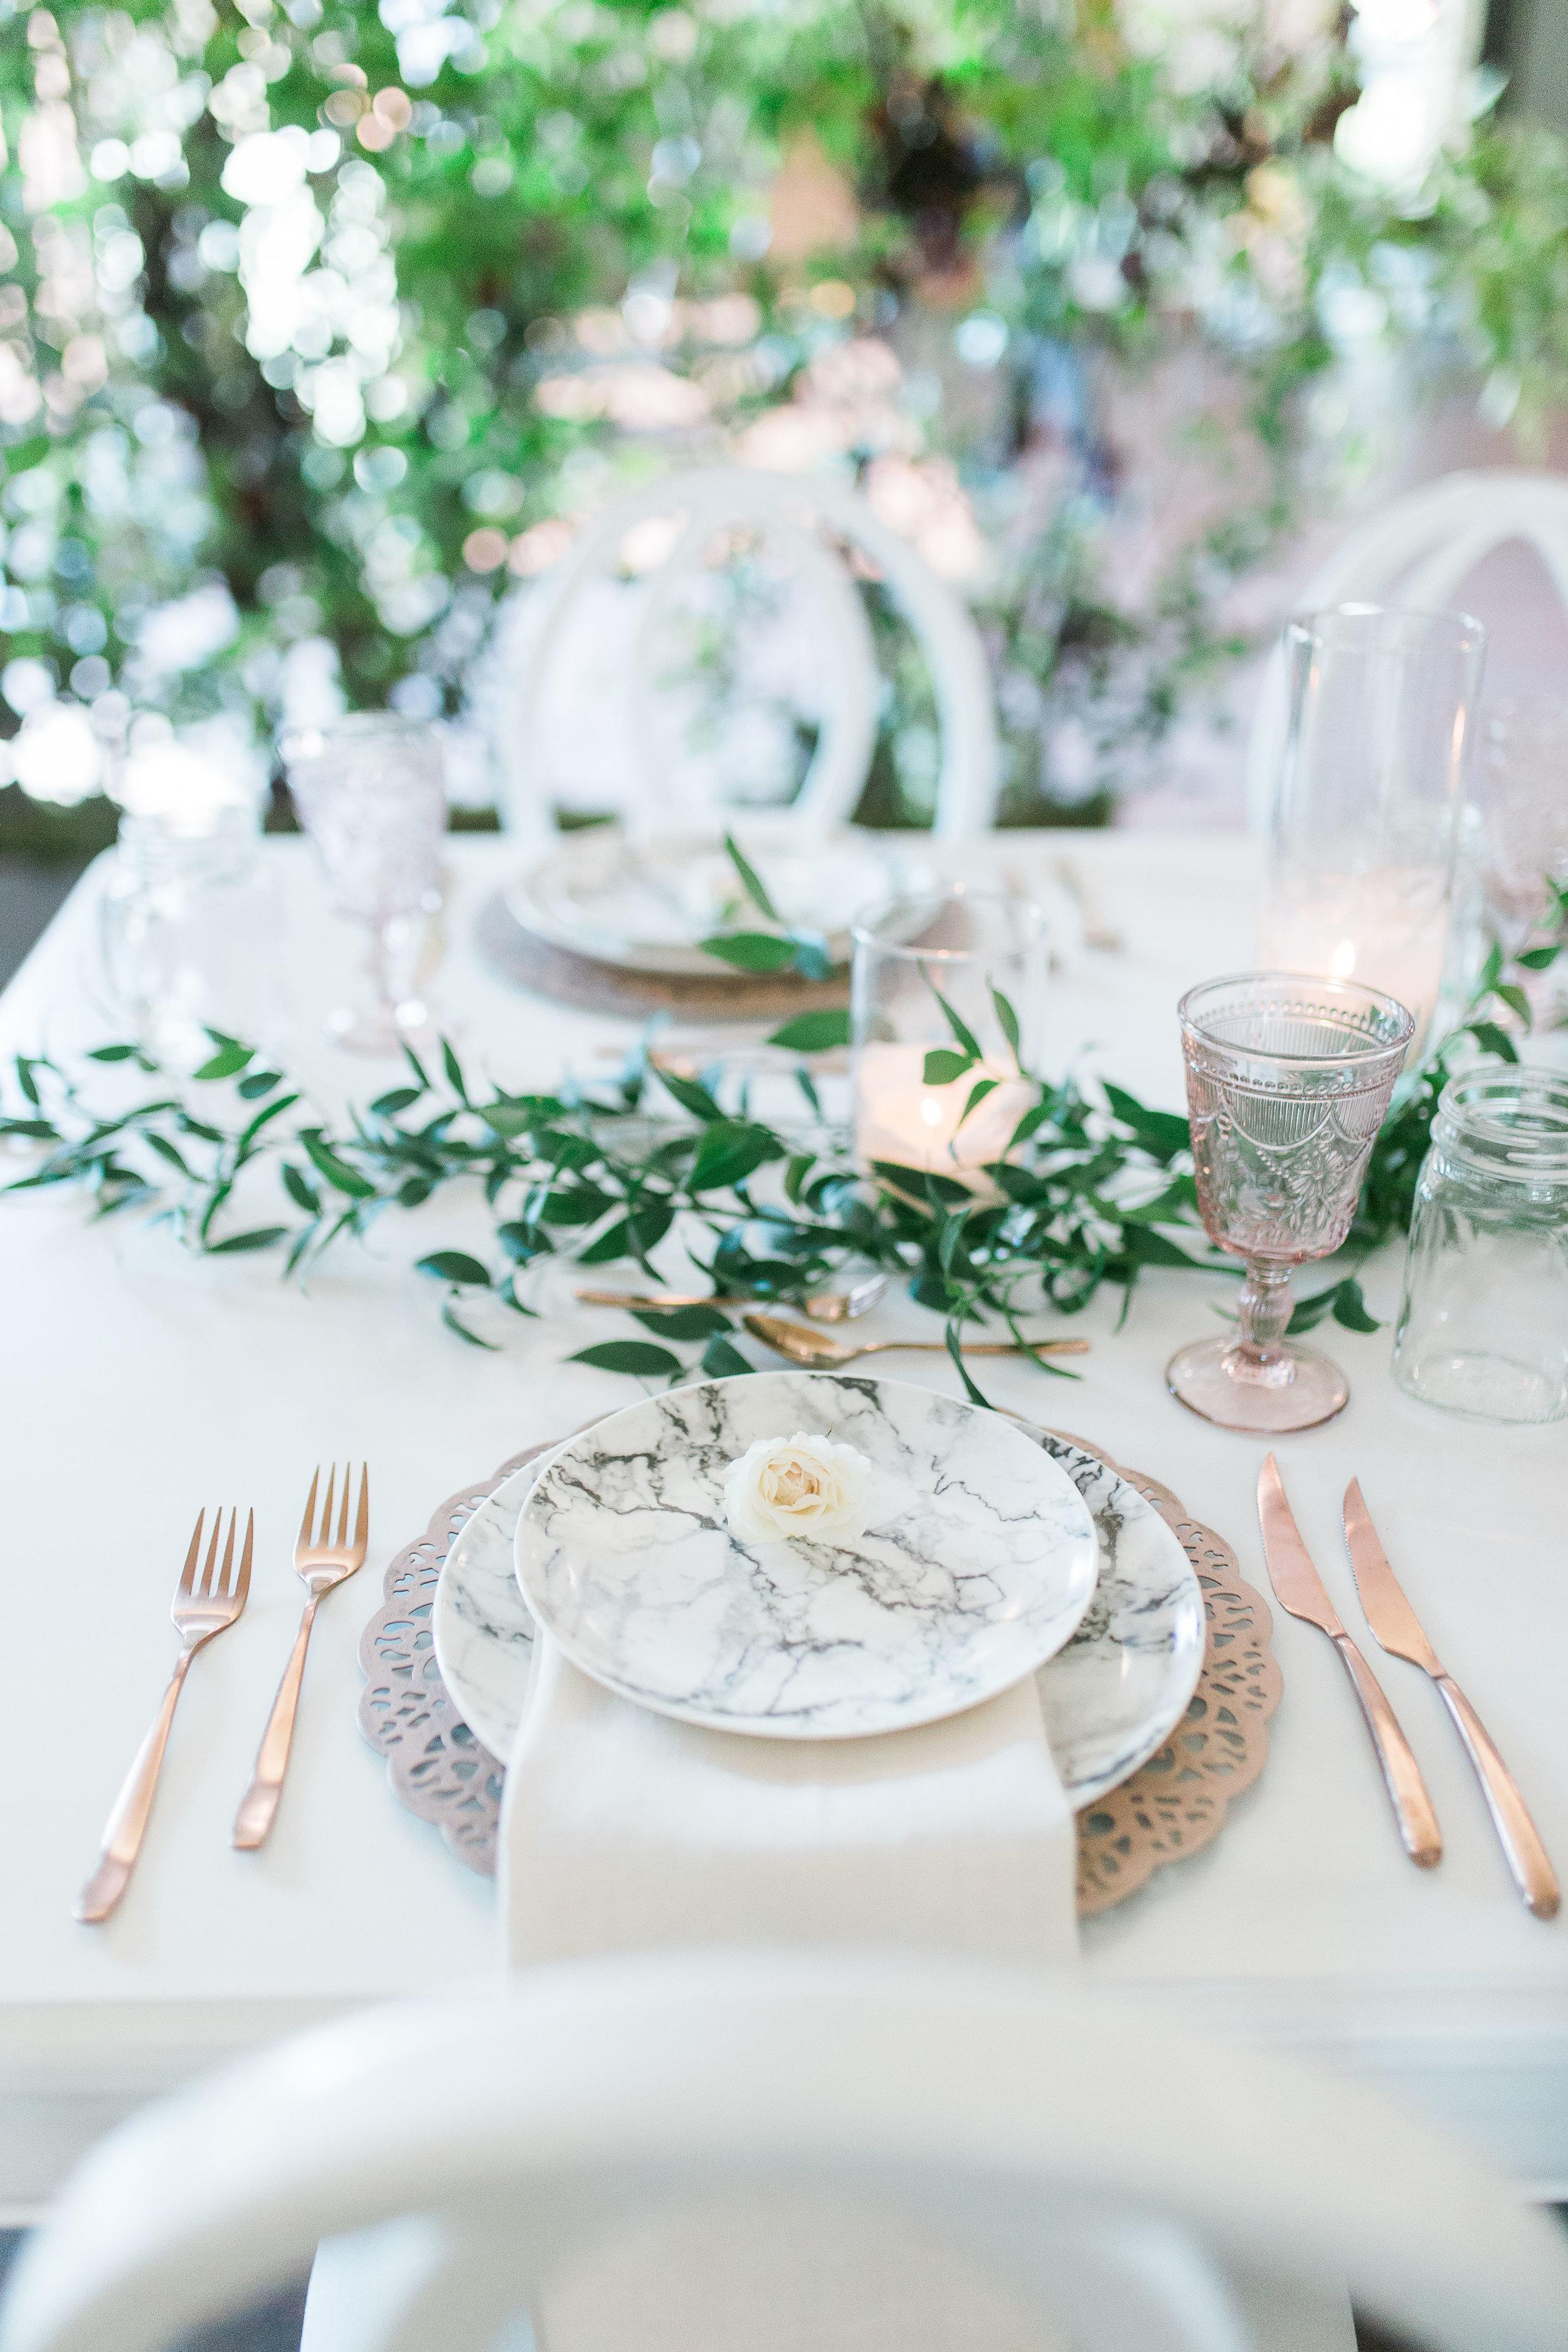 Hiddenbrooke-Wedding-Venue-by-JBJ-Pictures-202.jpg